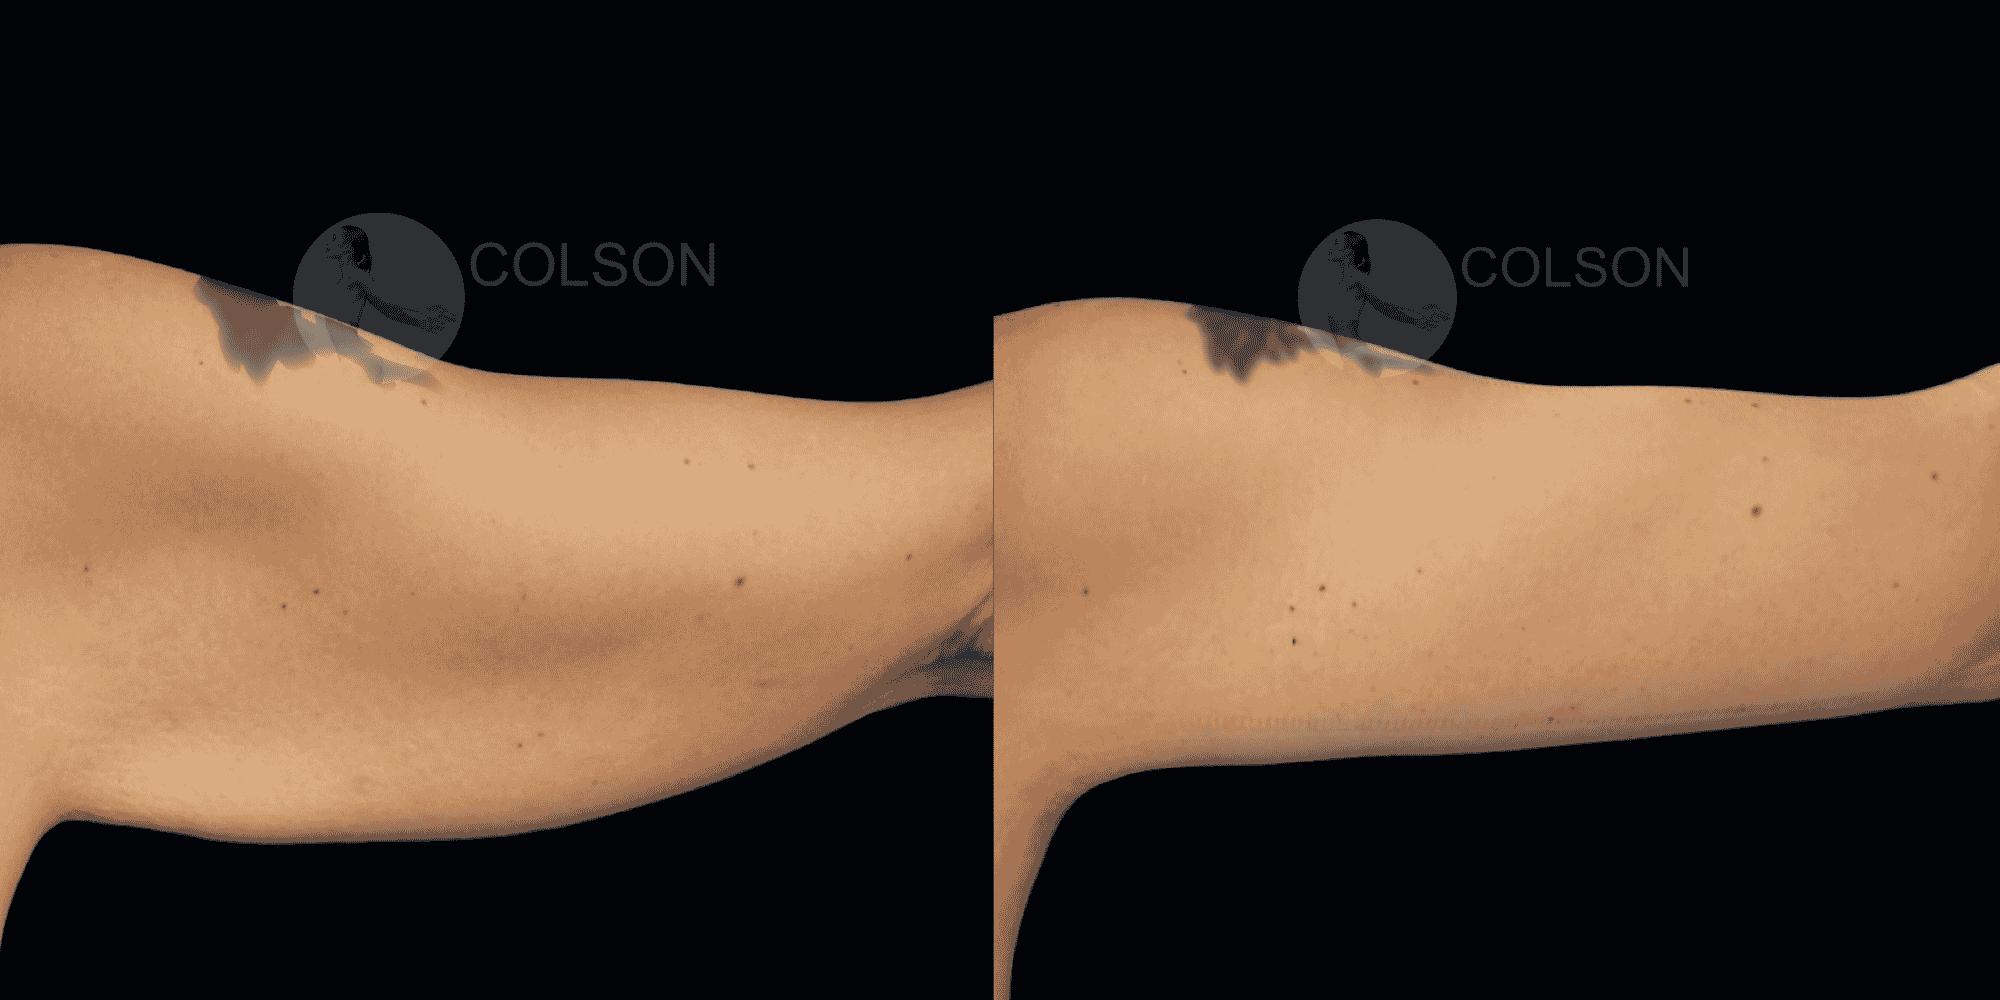 Dr Colson - Chirurgie silhouette - Lifting Bras Vue de Dos 2